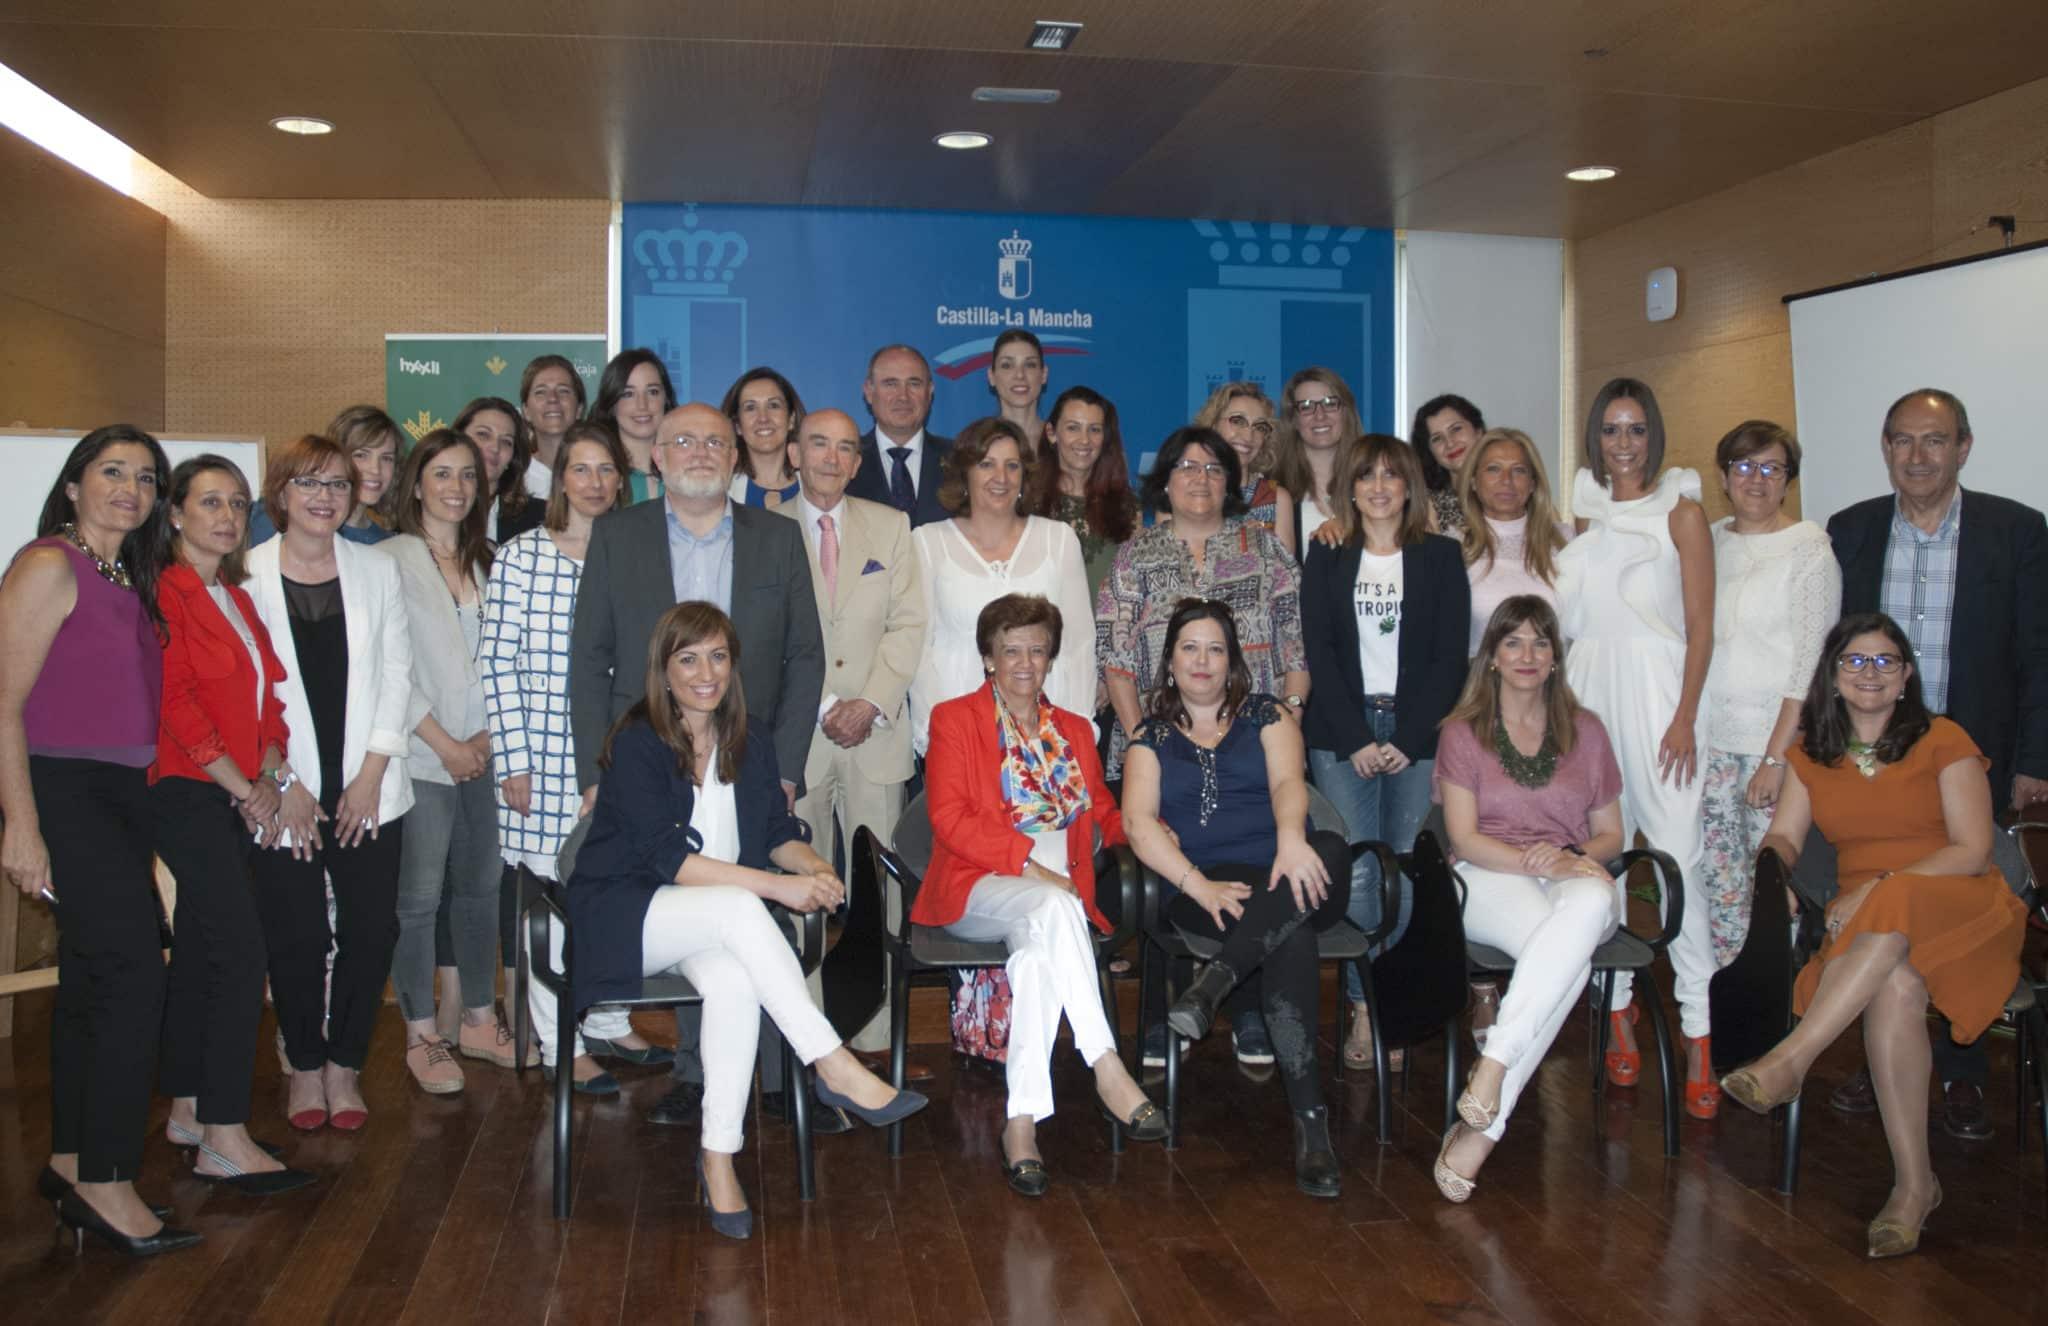 https://blog.globalcaja.es/wp-content/uploads/2018/06/Clausura-MED-AA.jpg